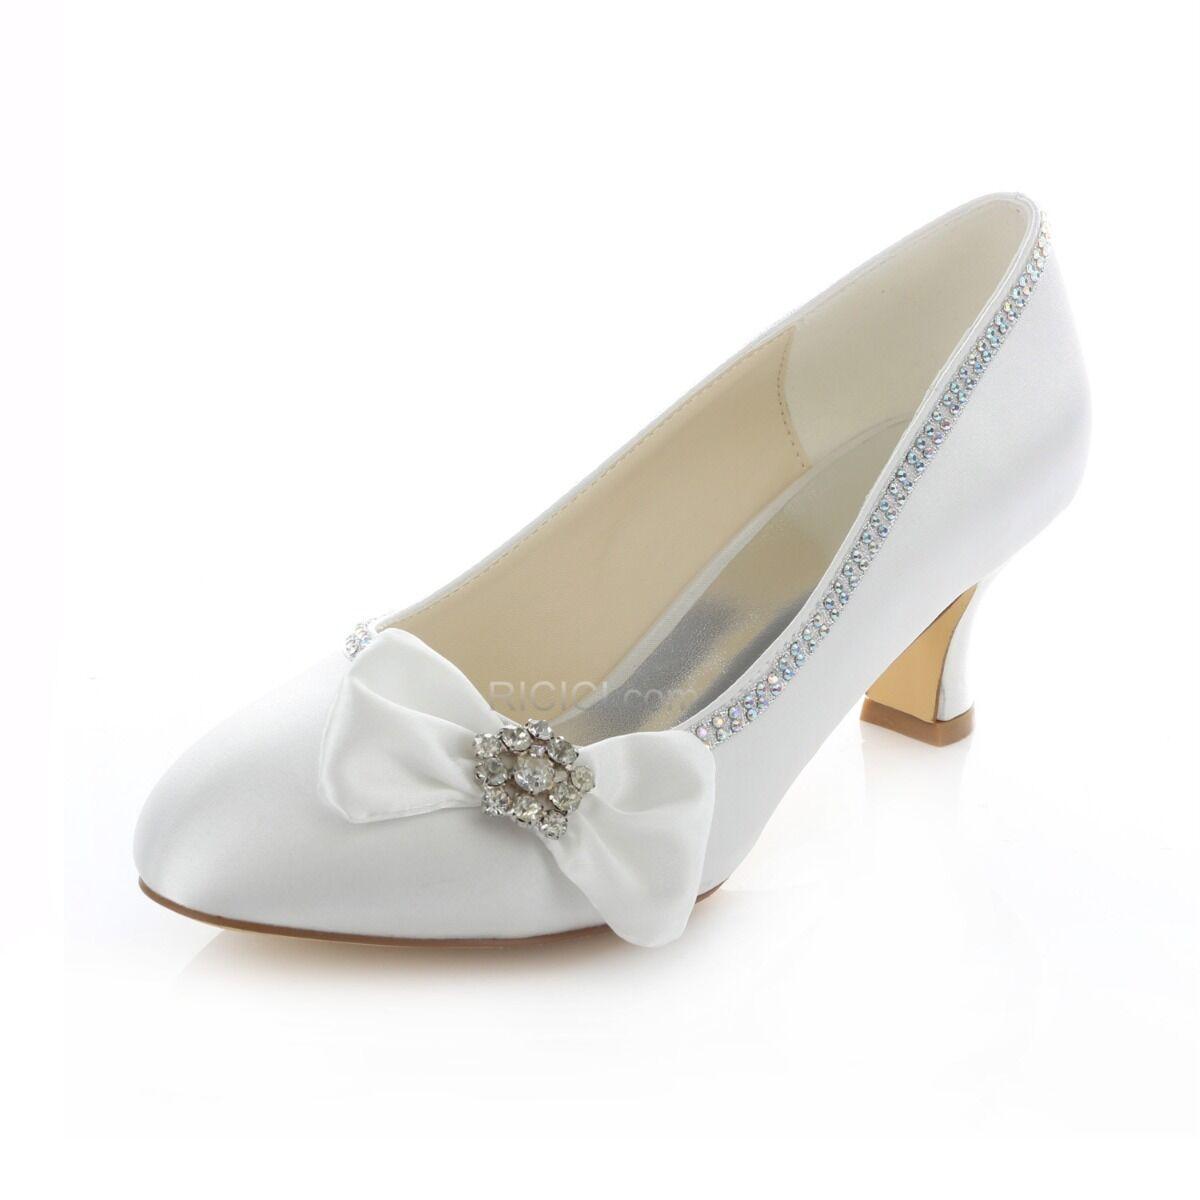 2 inch Satin Heels Bridal Bridesmaid